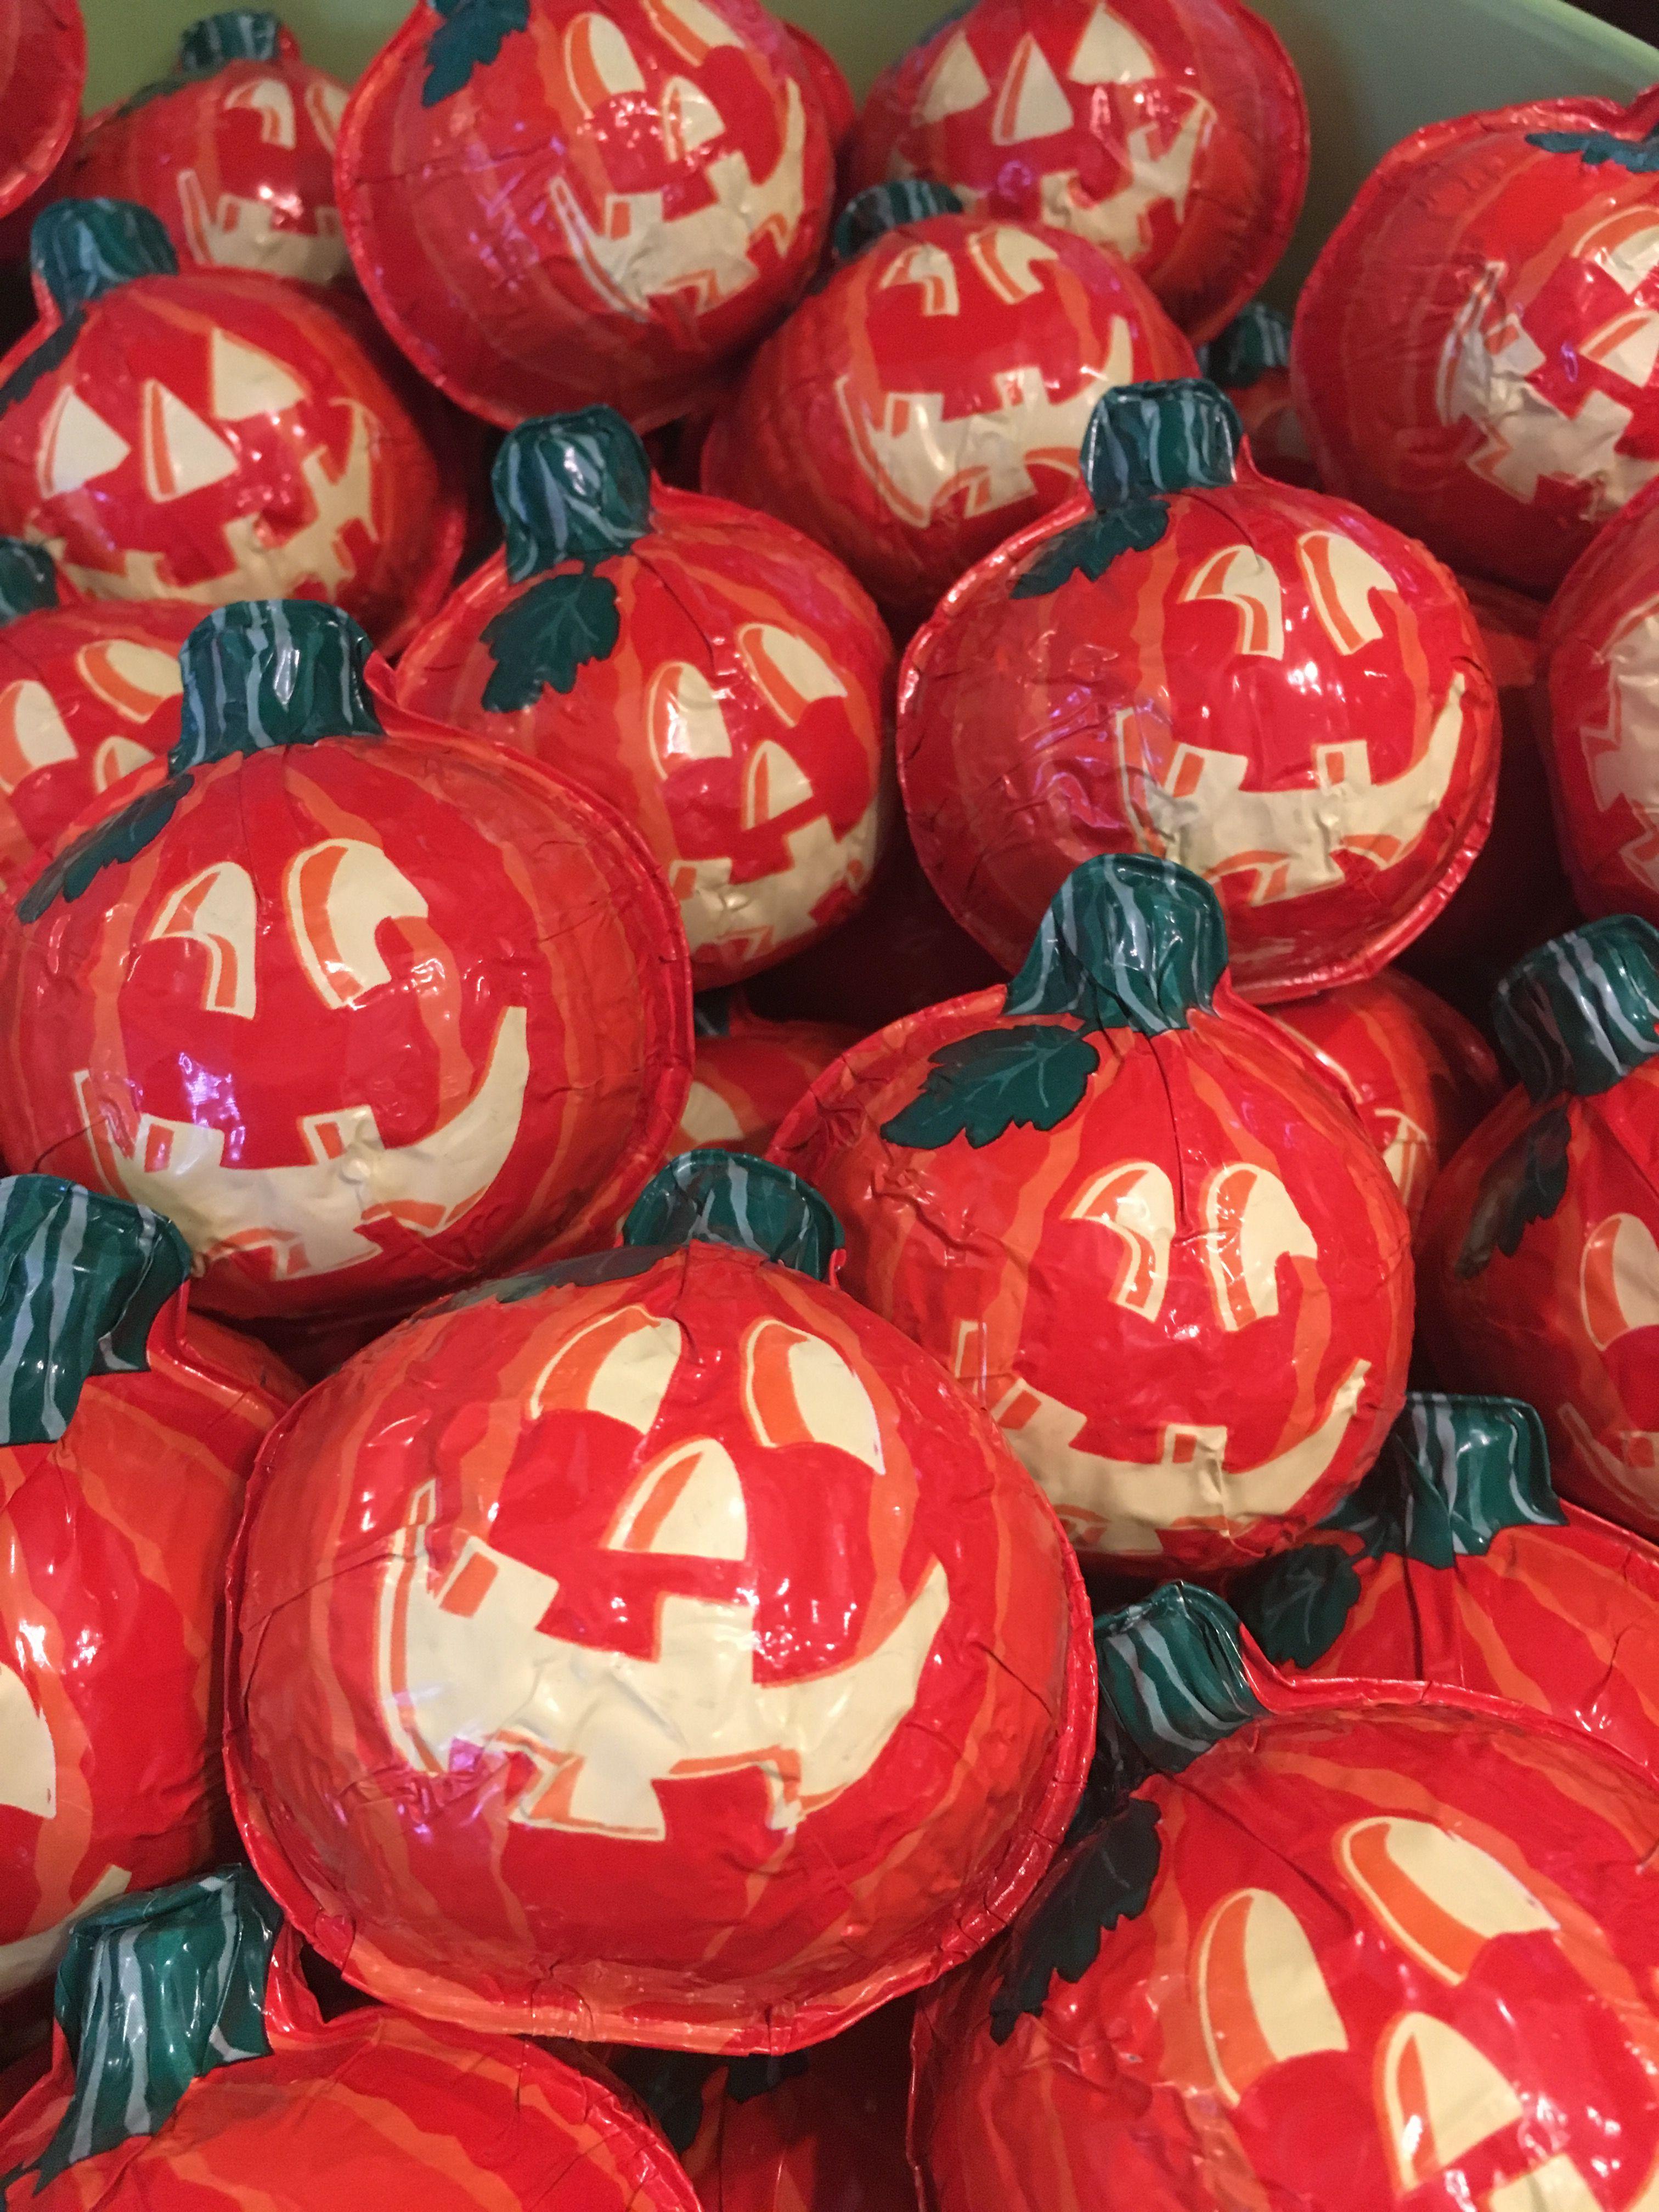 Pin by Nandy's Candy on Halloween Jack o lantern